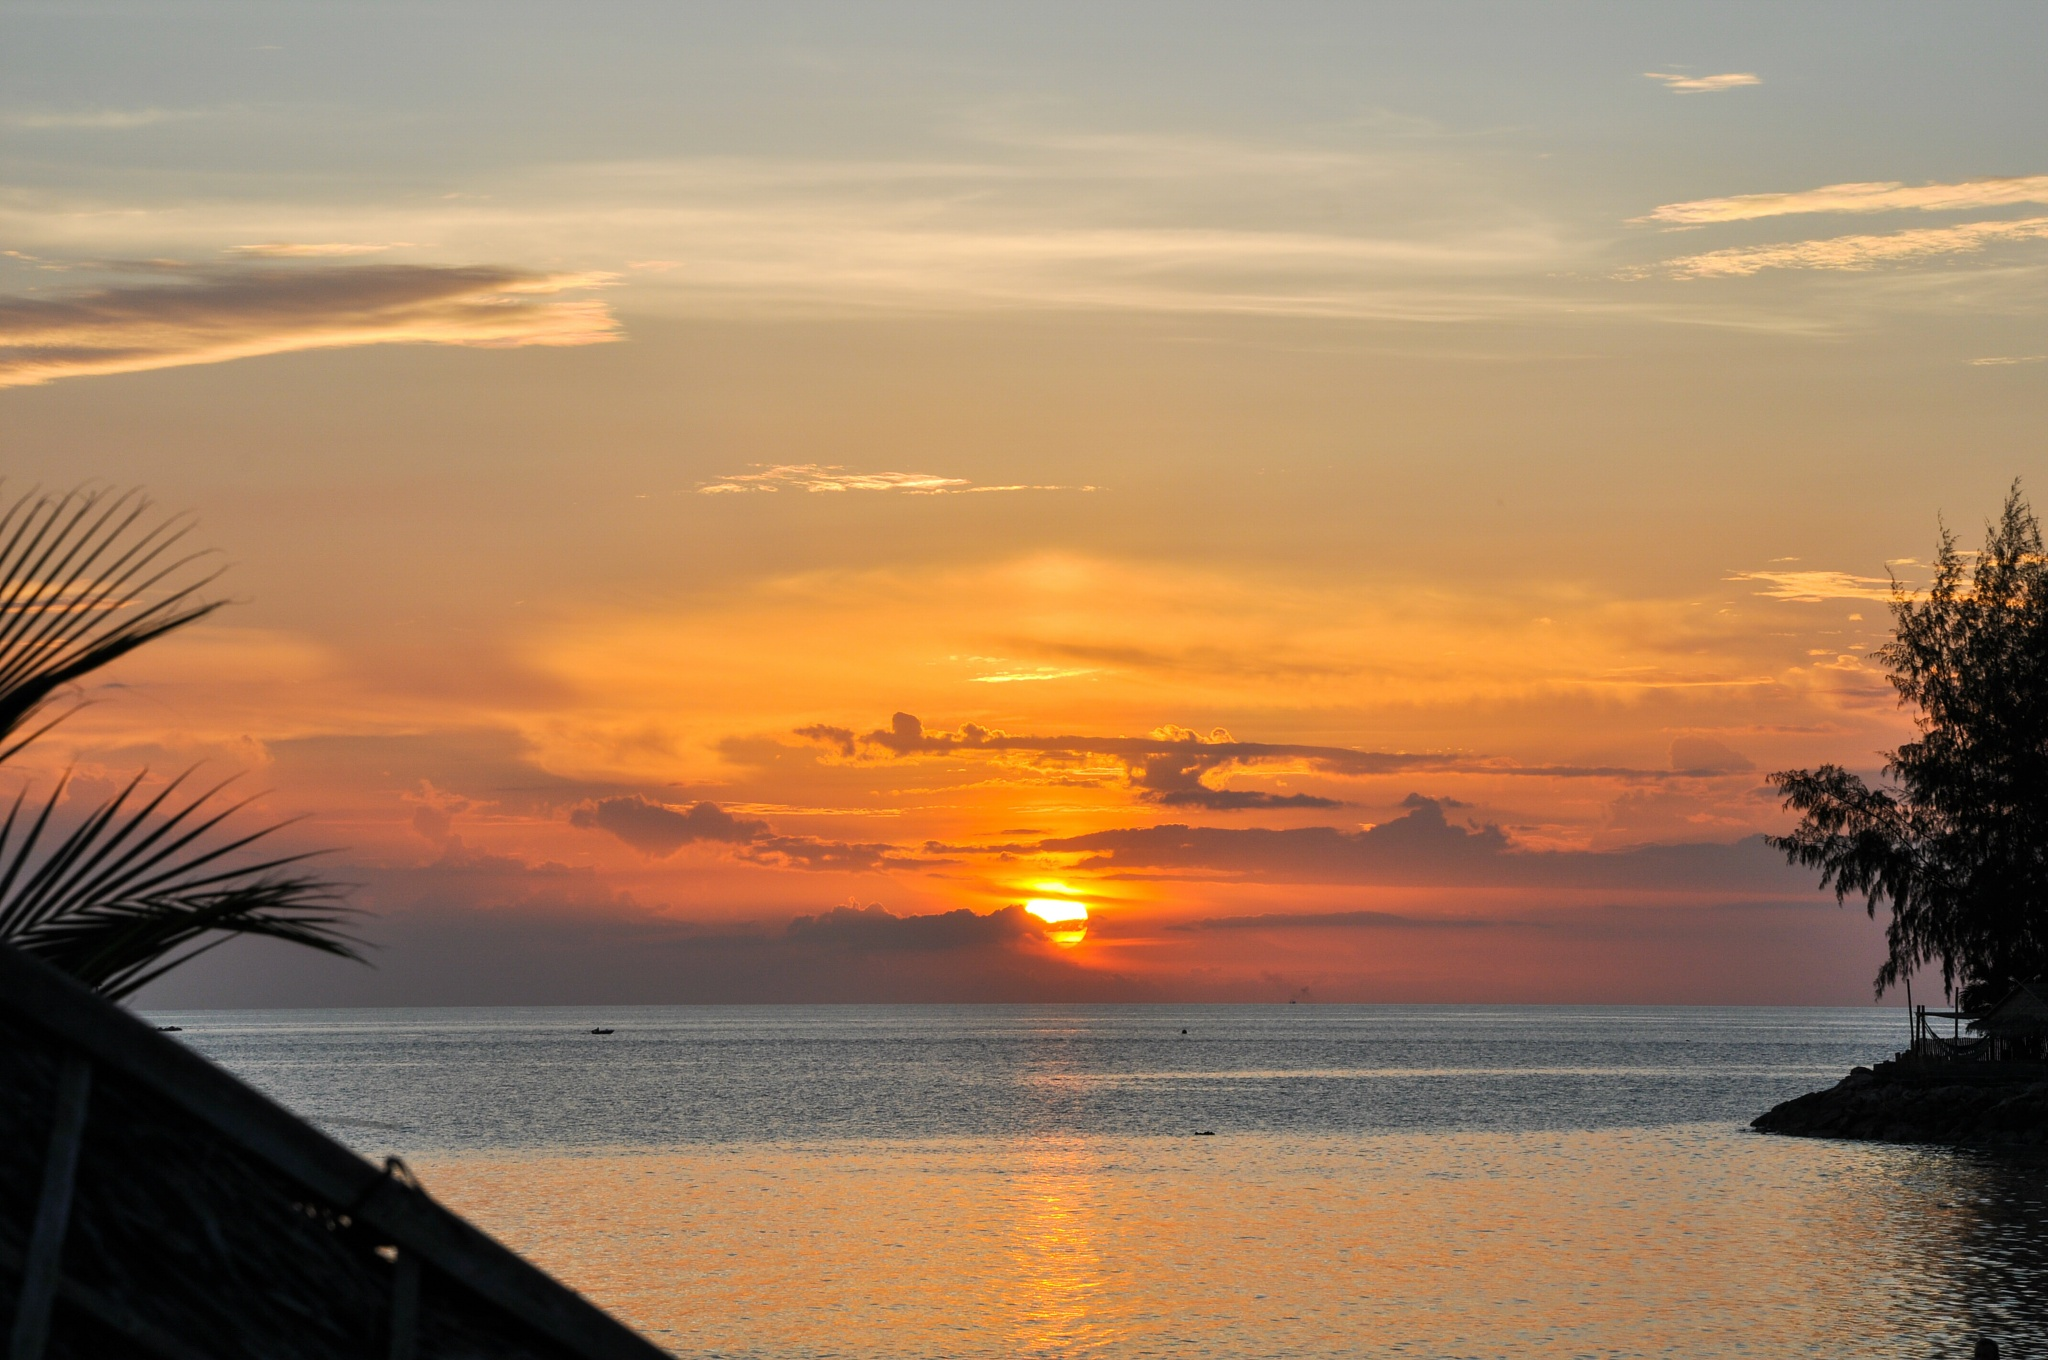 phangan sunset by Tomtom79